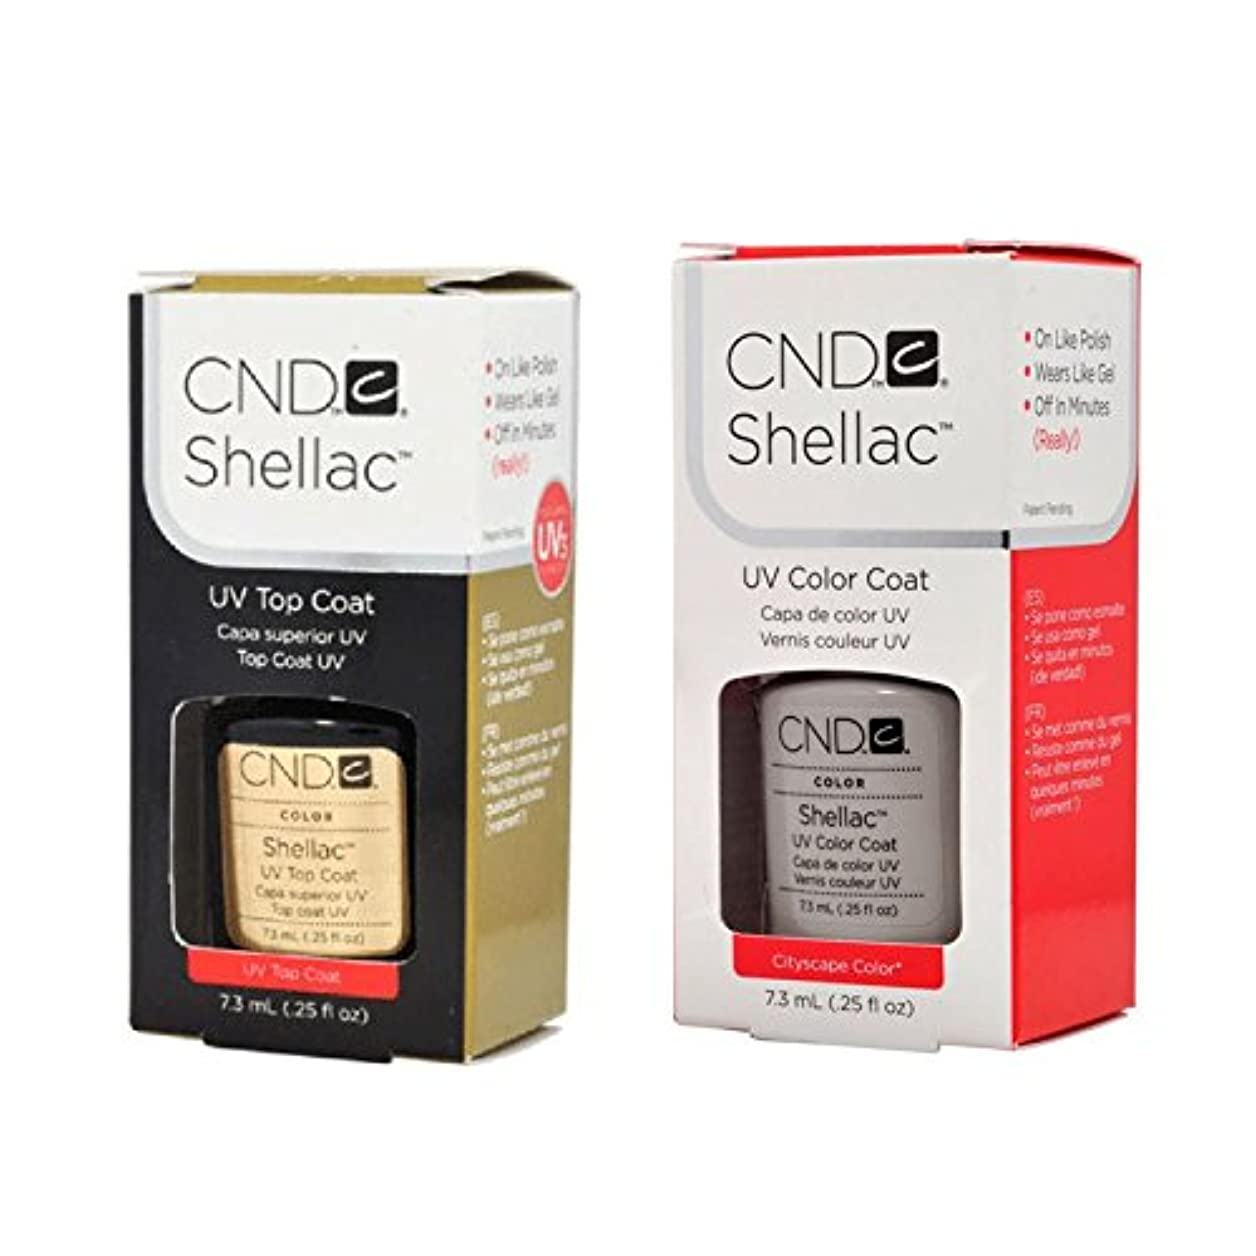 CND Shellac UVトップコート 7.3m l  &  UV カラーコー< Cityscape>7.3ml [海外直送品]